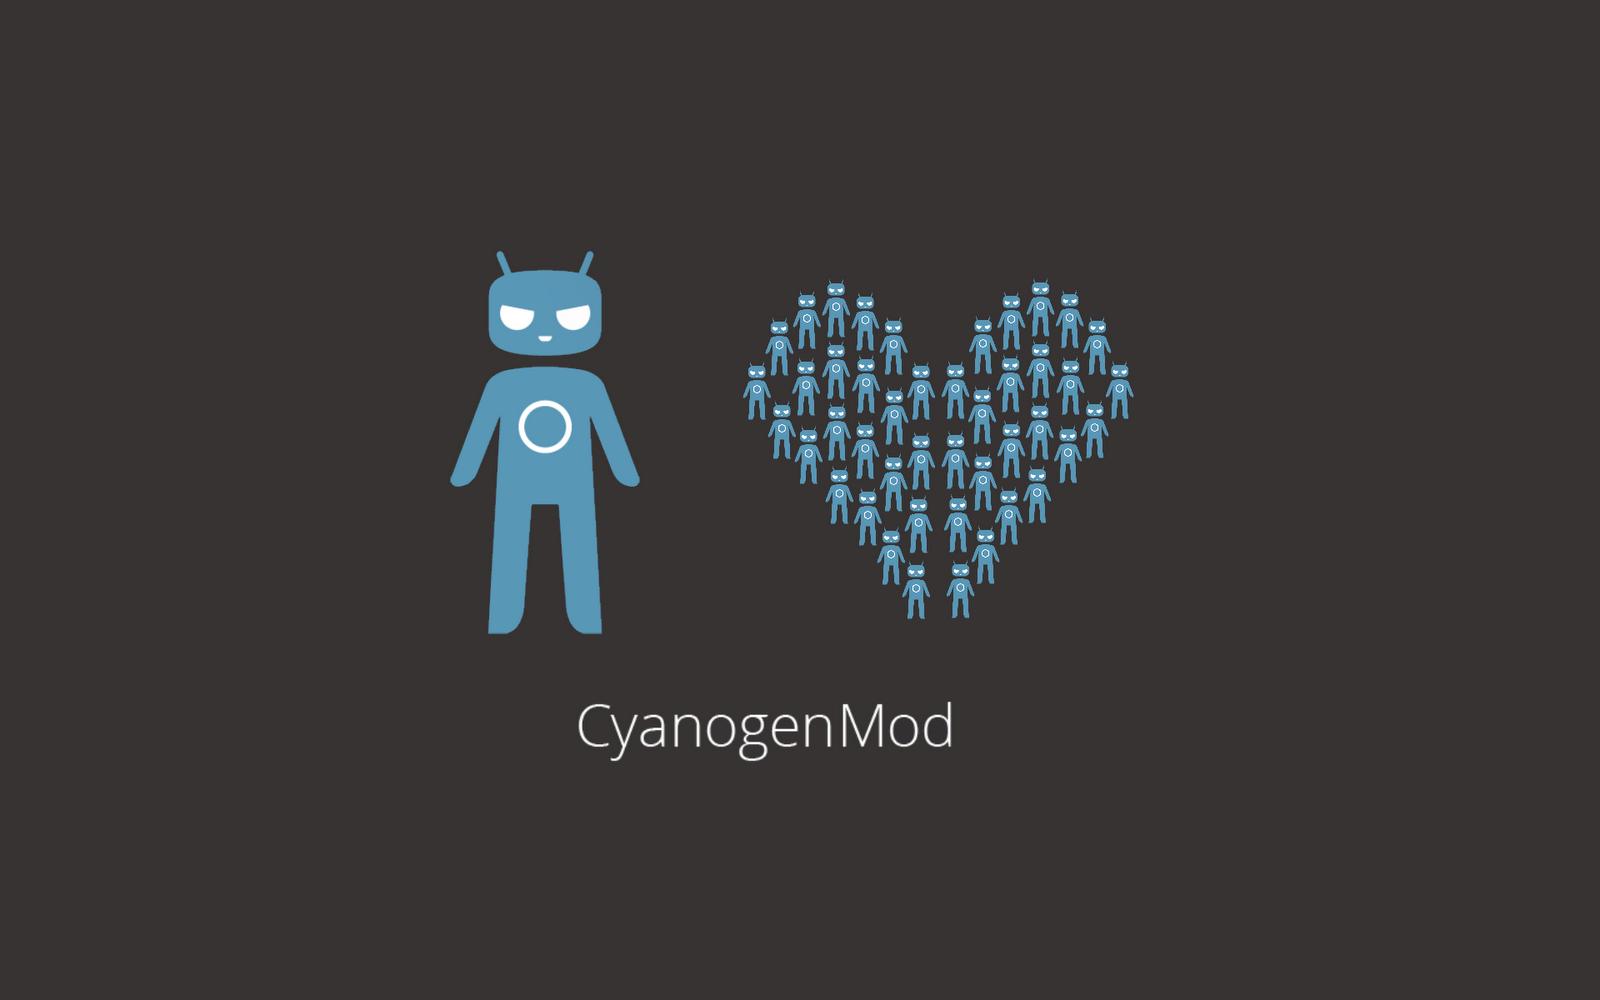 Nougat on OnePlus X CyanogenMod